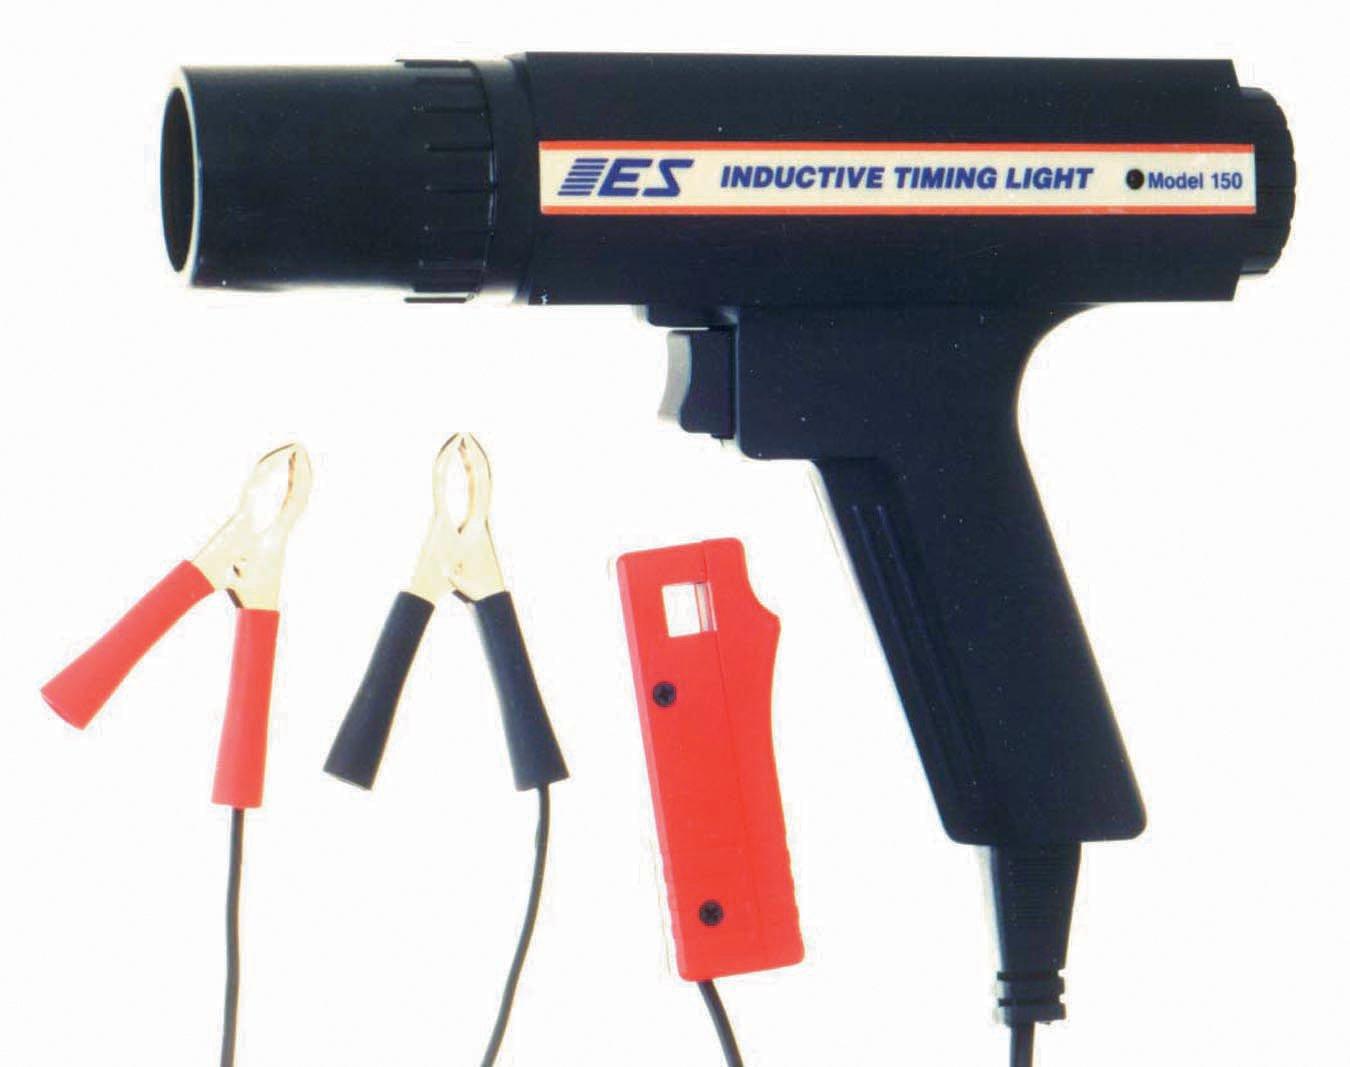 ESI 150 Inductive Timing Light